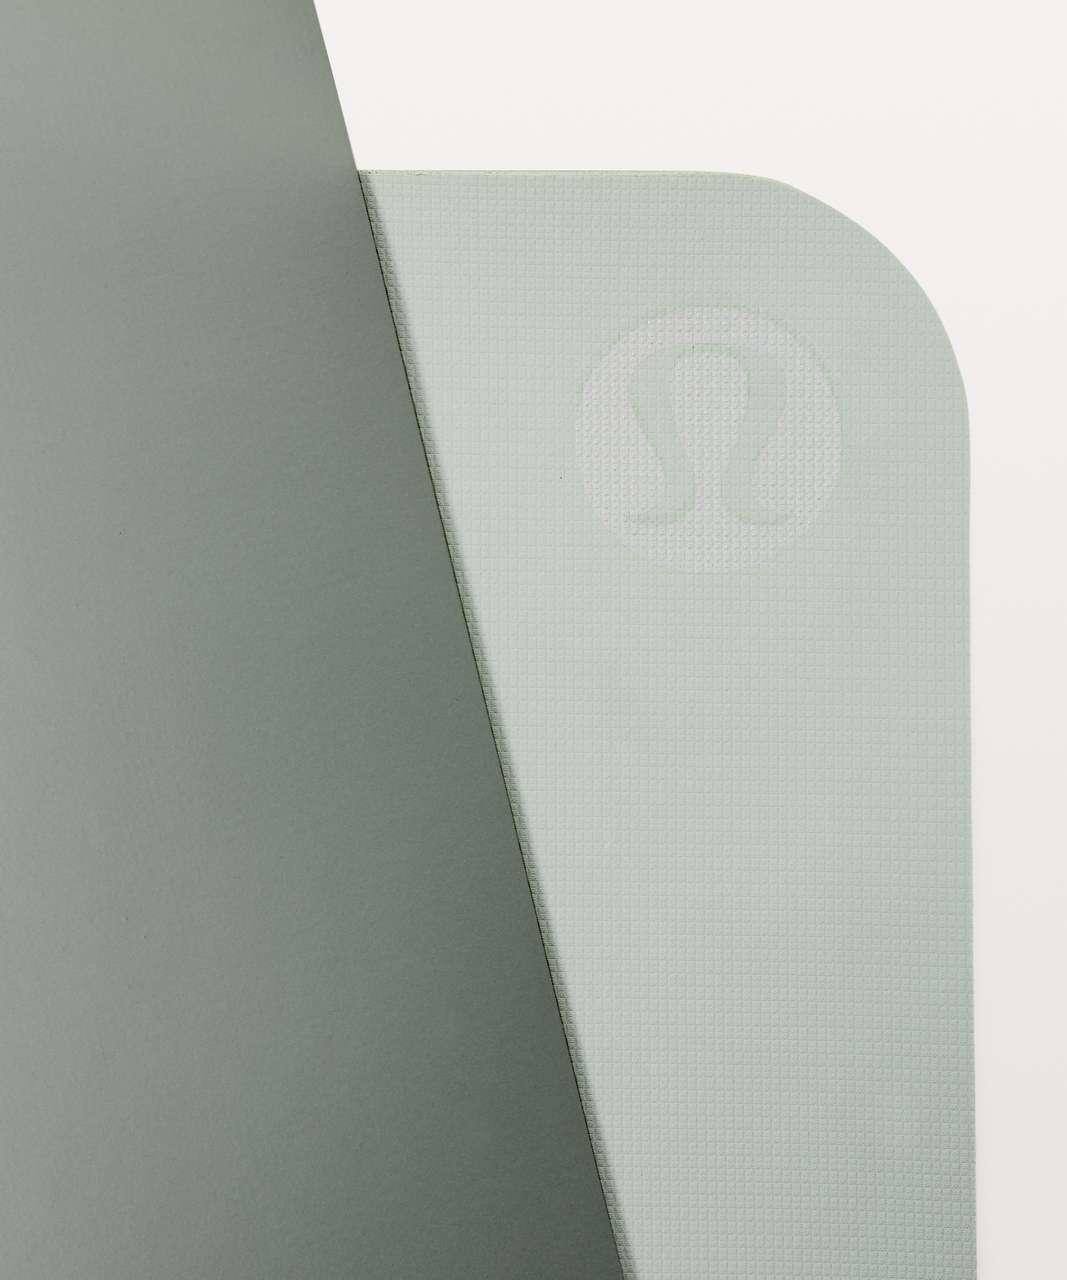 Lululemon The Reversible Mat 5mm - Earl Grey / Misty Moss